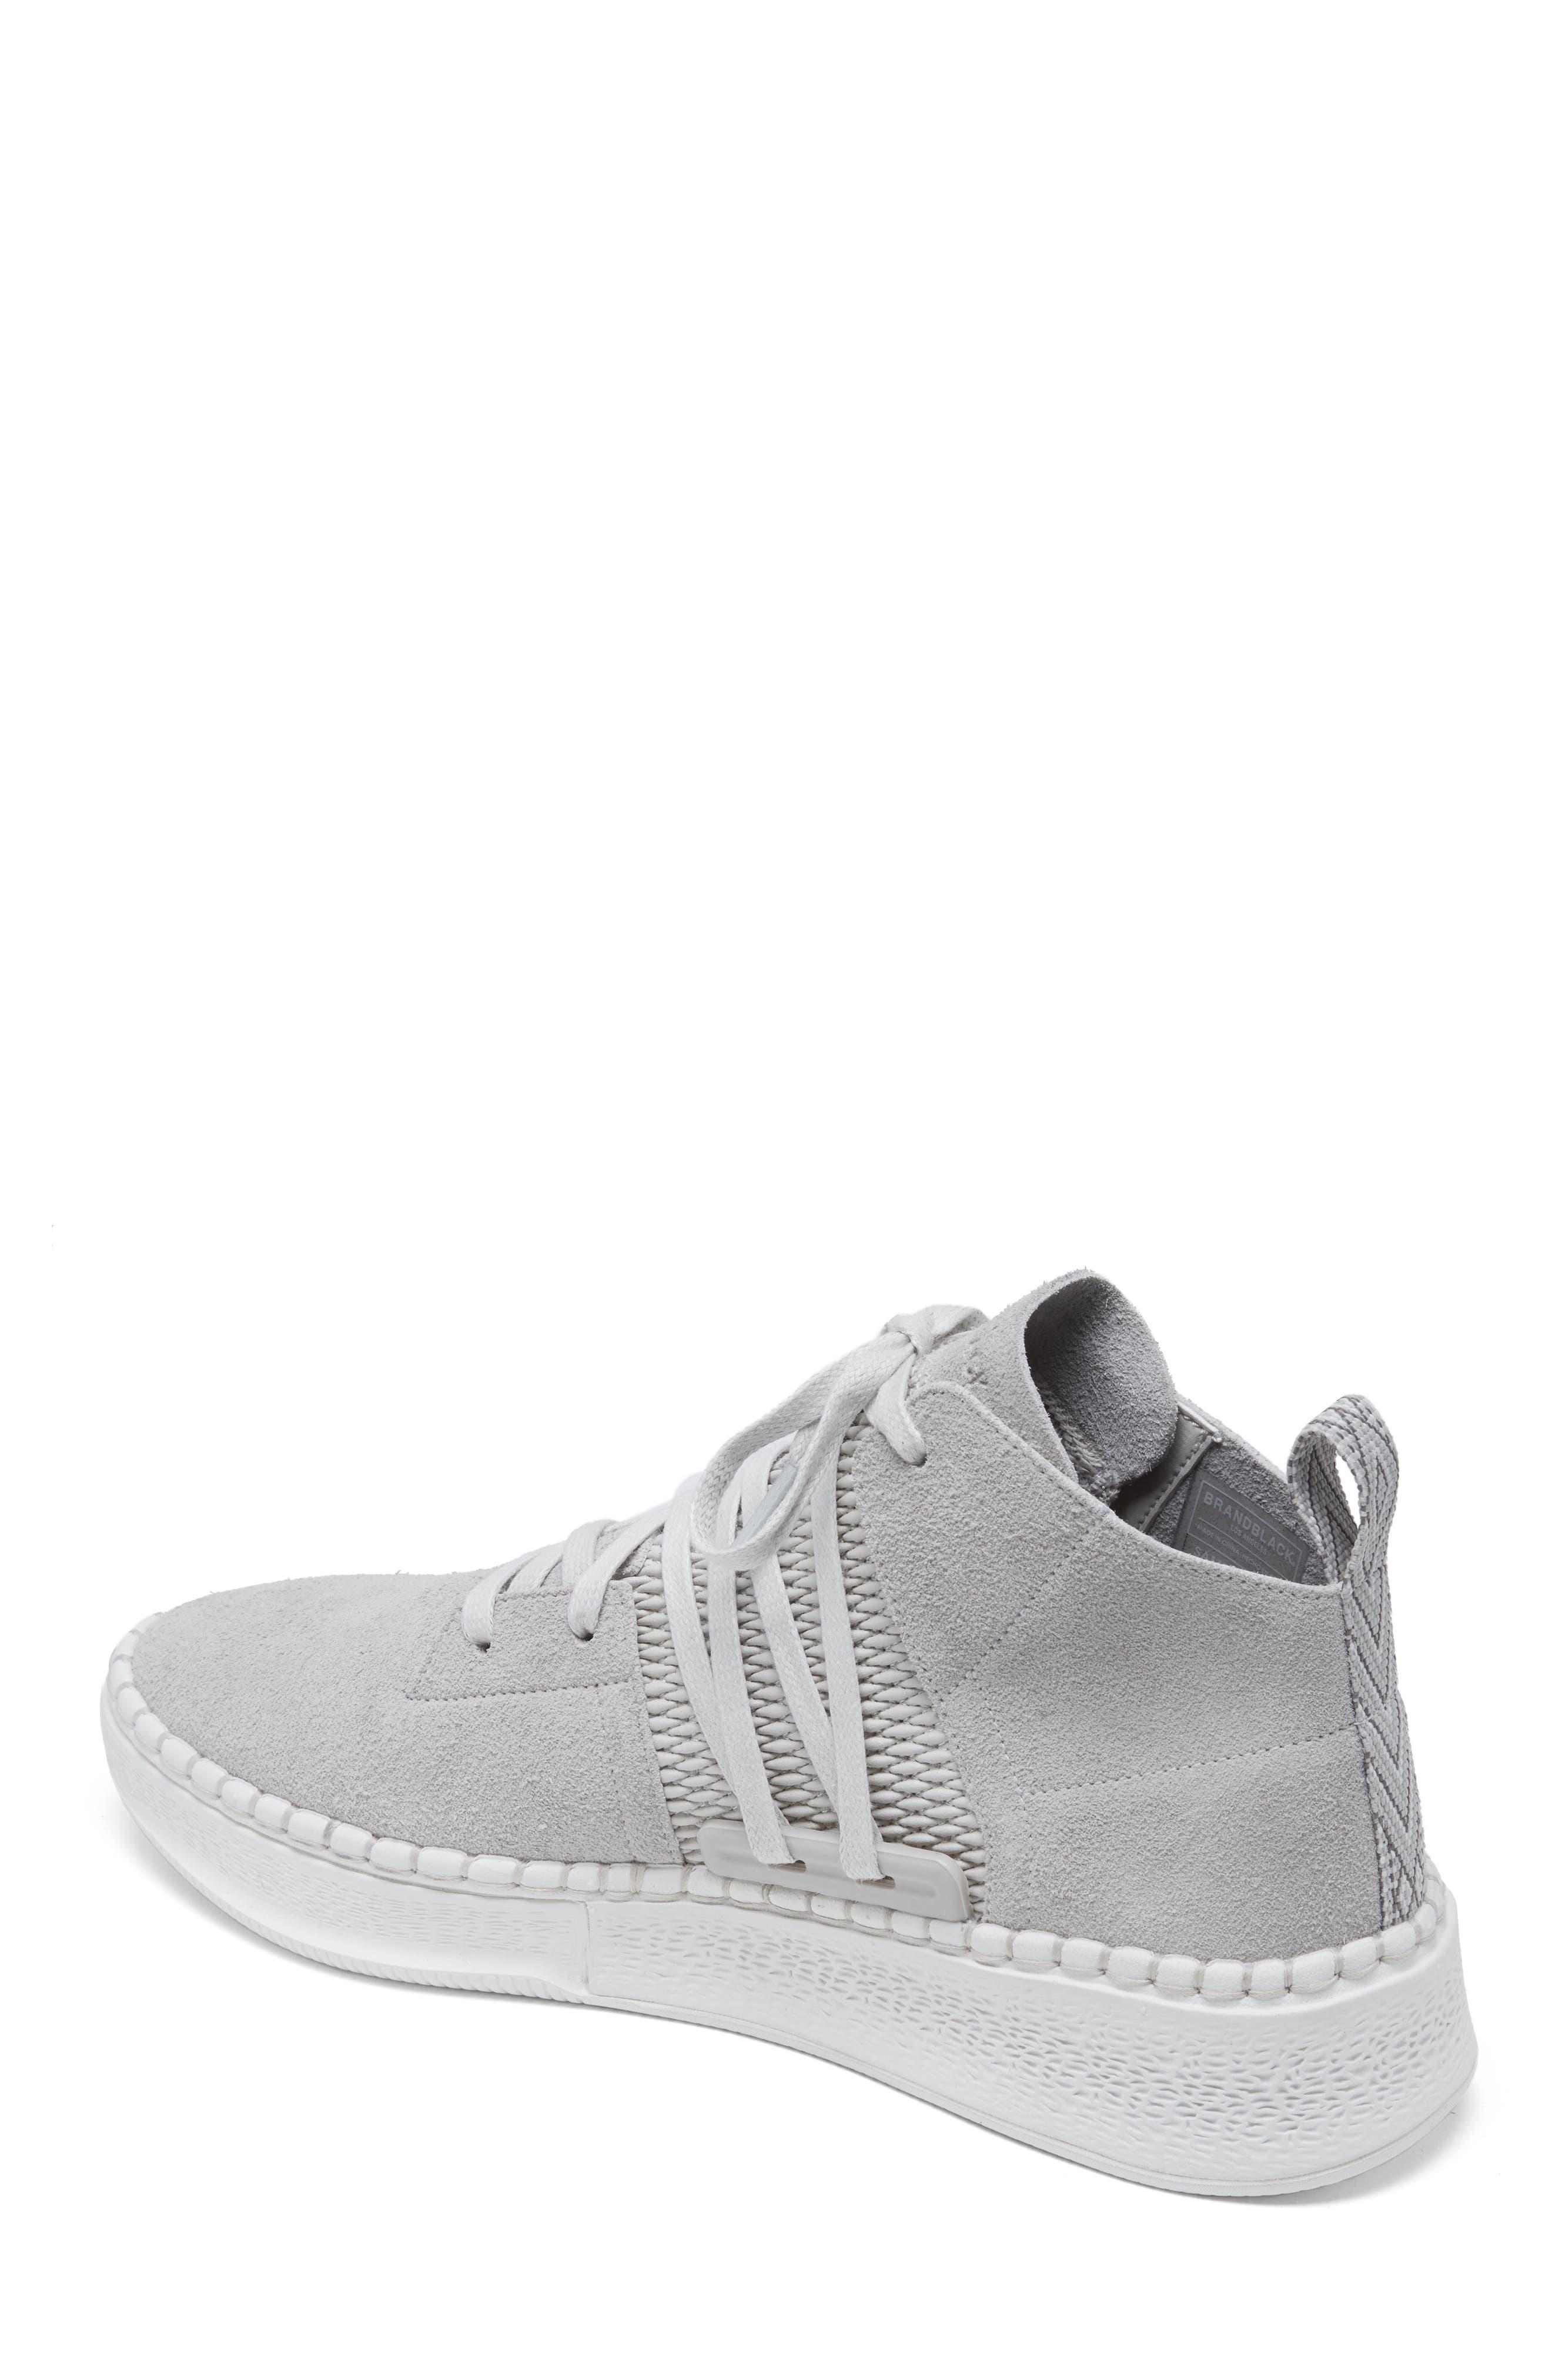 Delta Sneaker,                             Alternate thumbnail 2, color,                             Beige